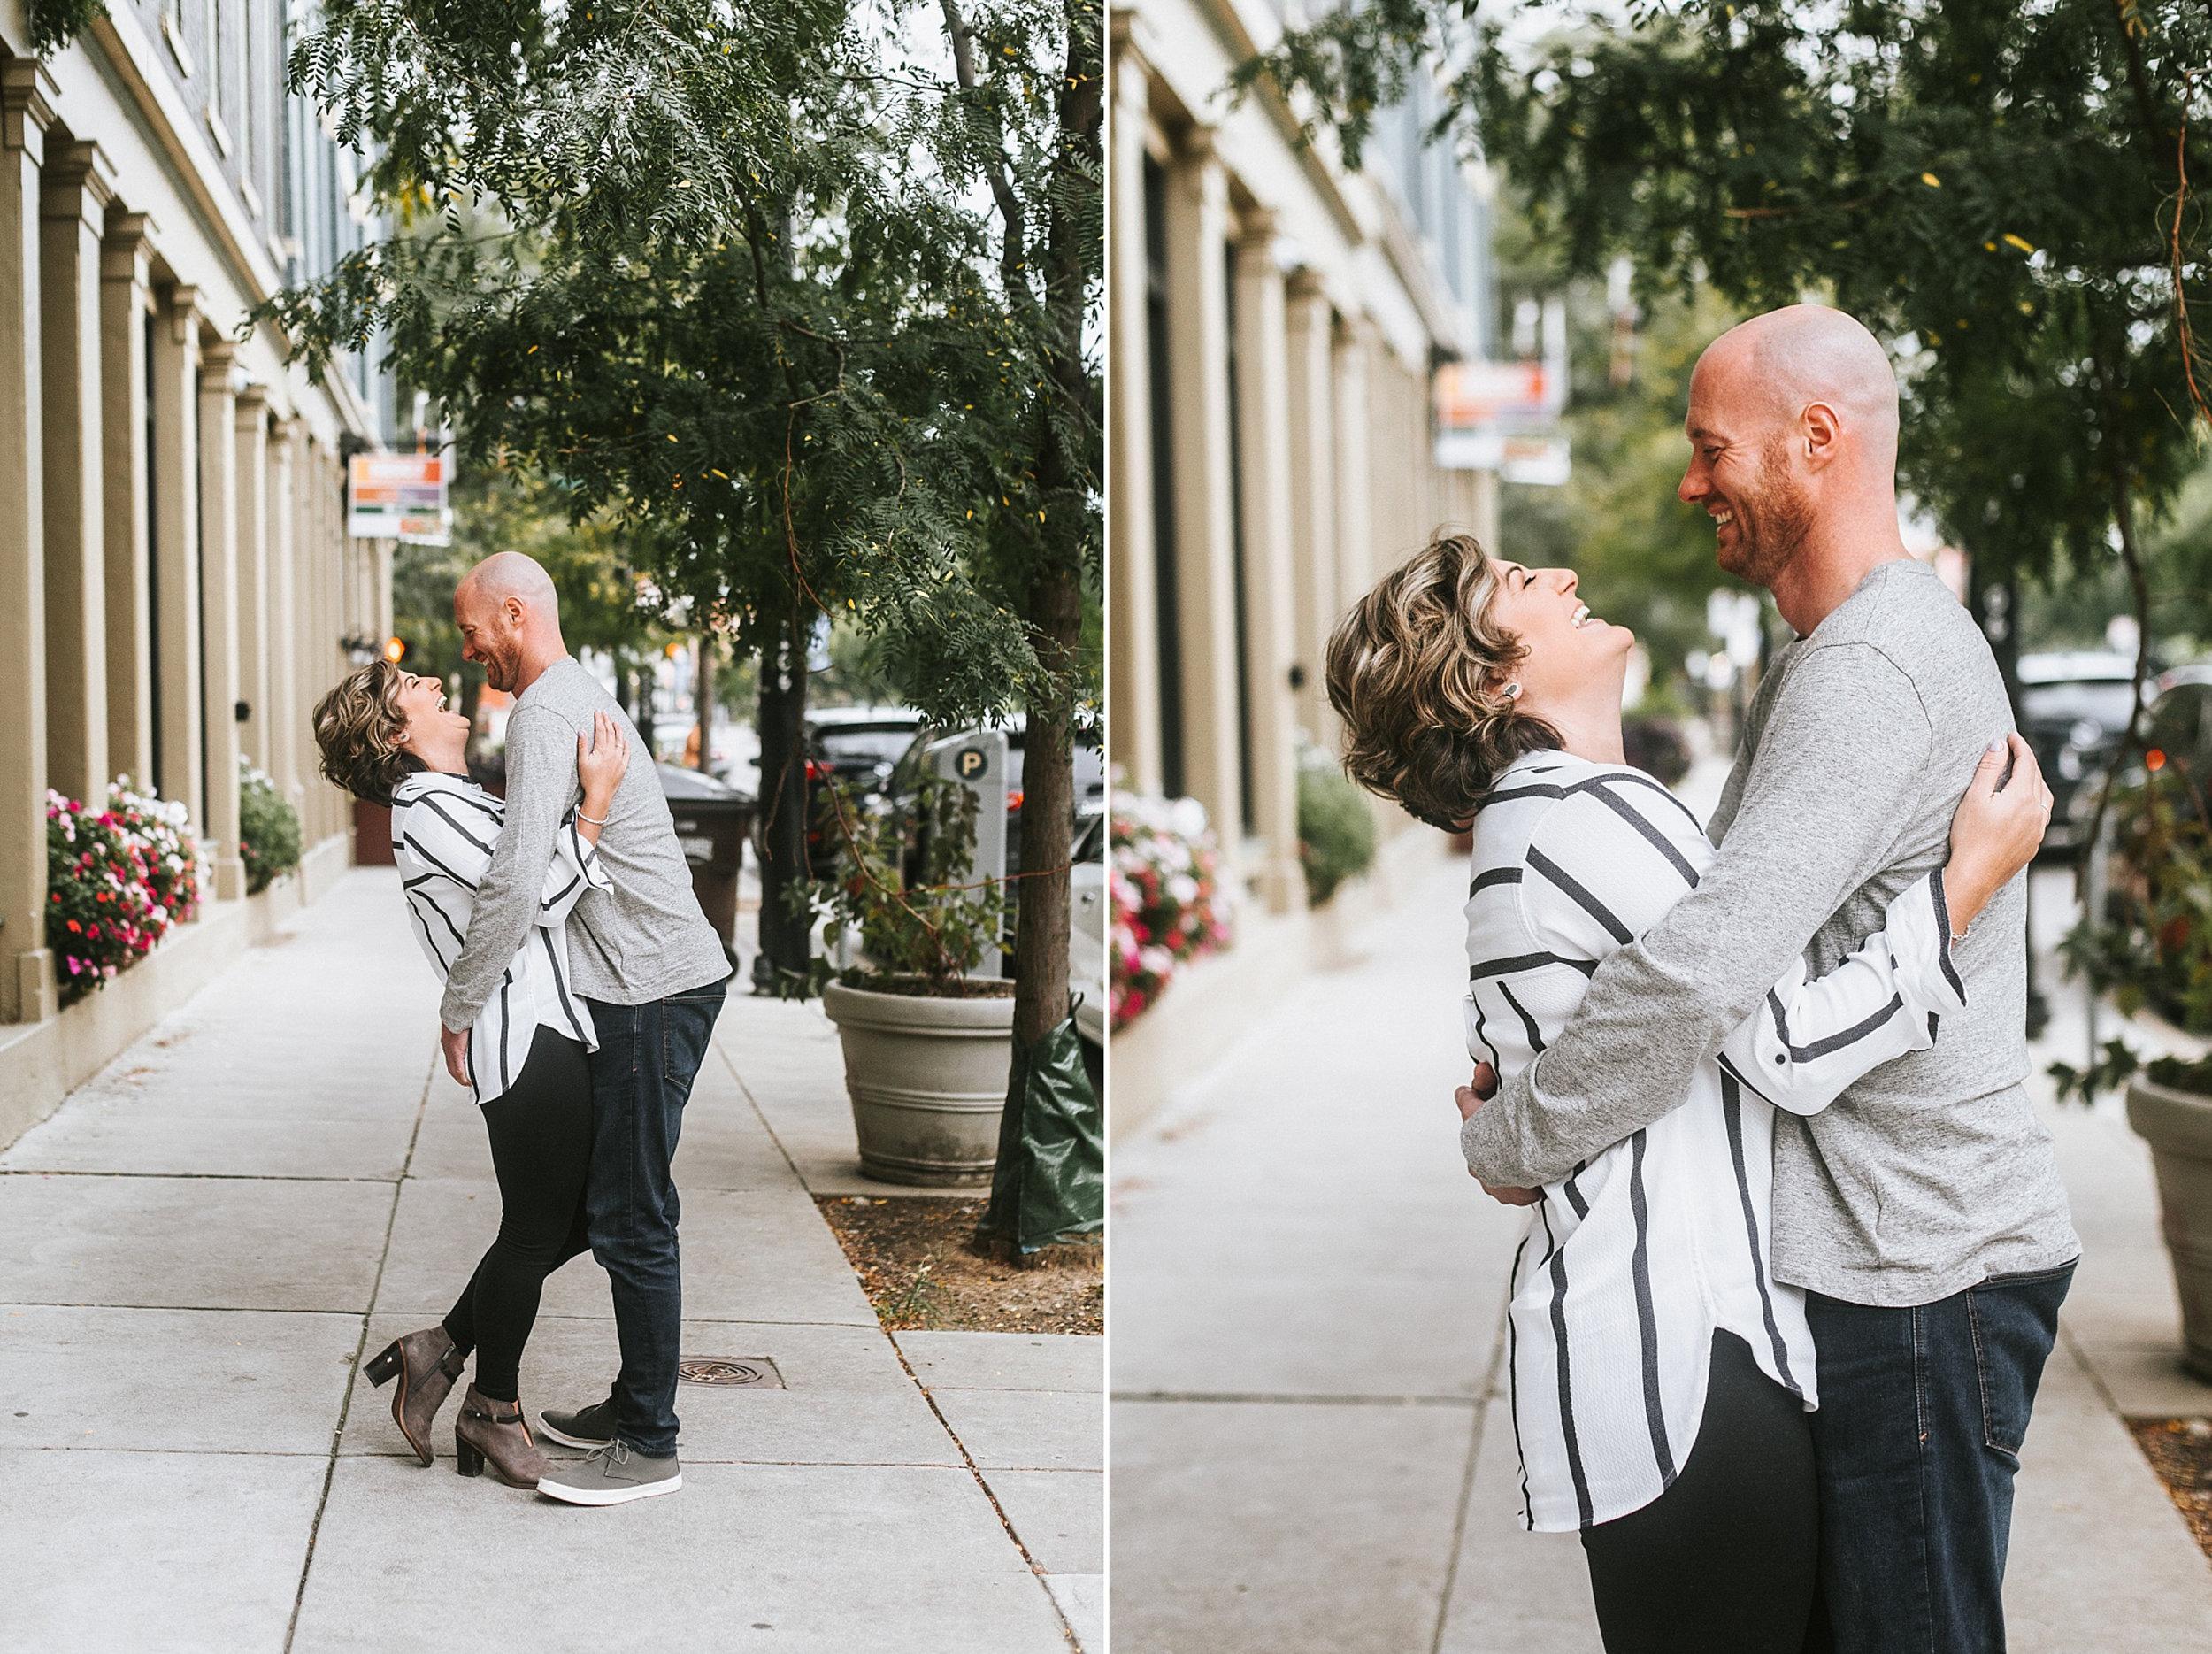 Brooke Townsend Photography - Ohio Wedding Photographer-15.jpg